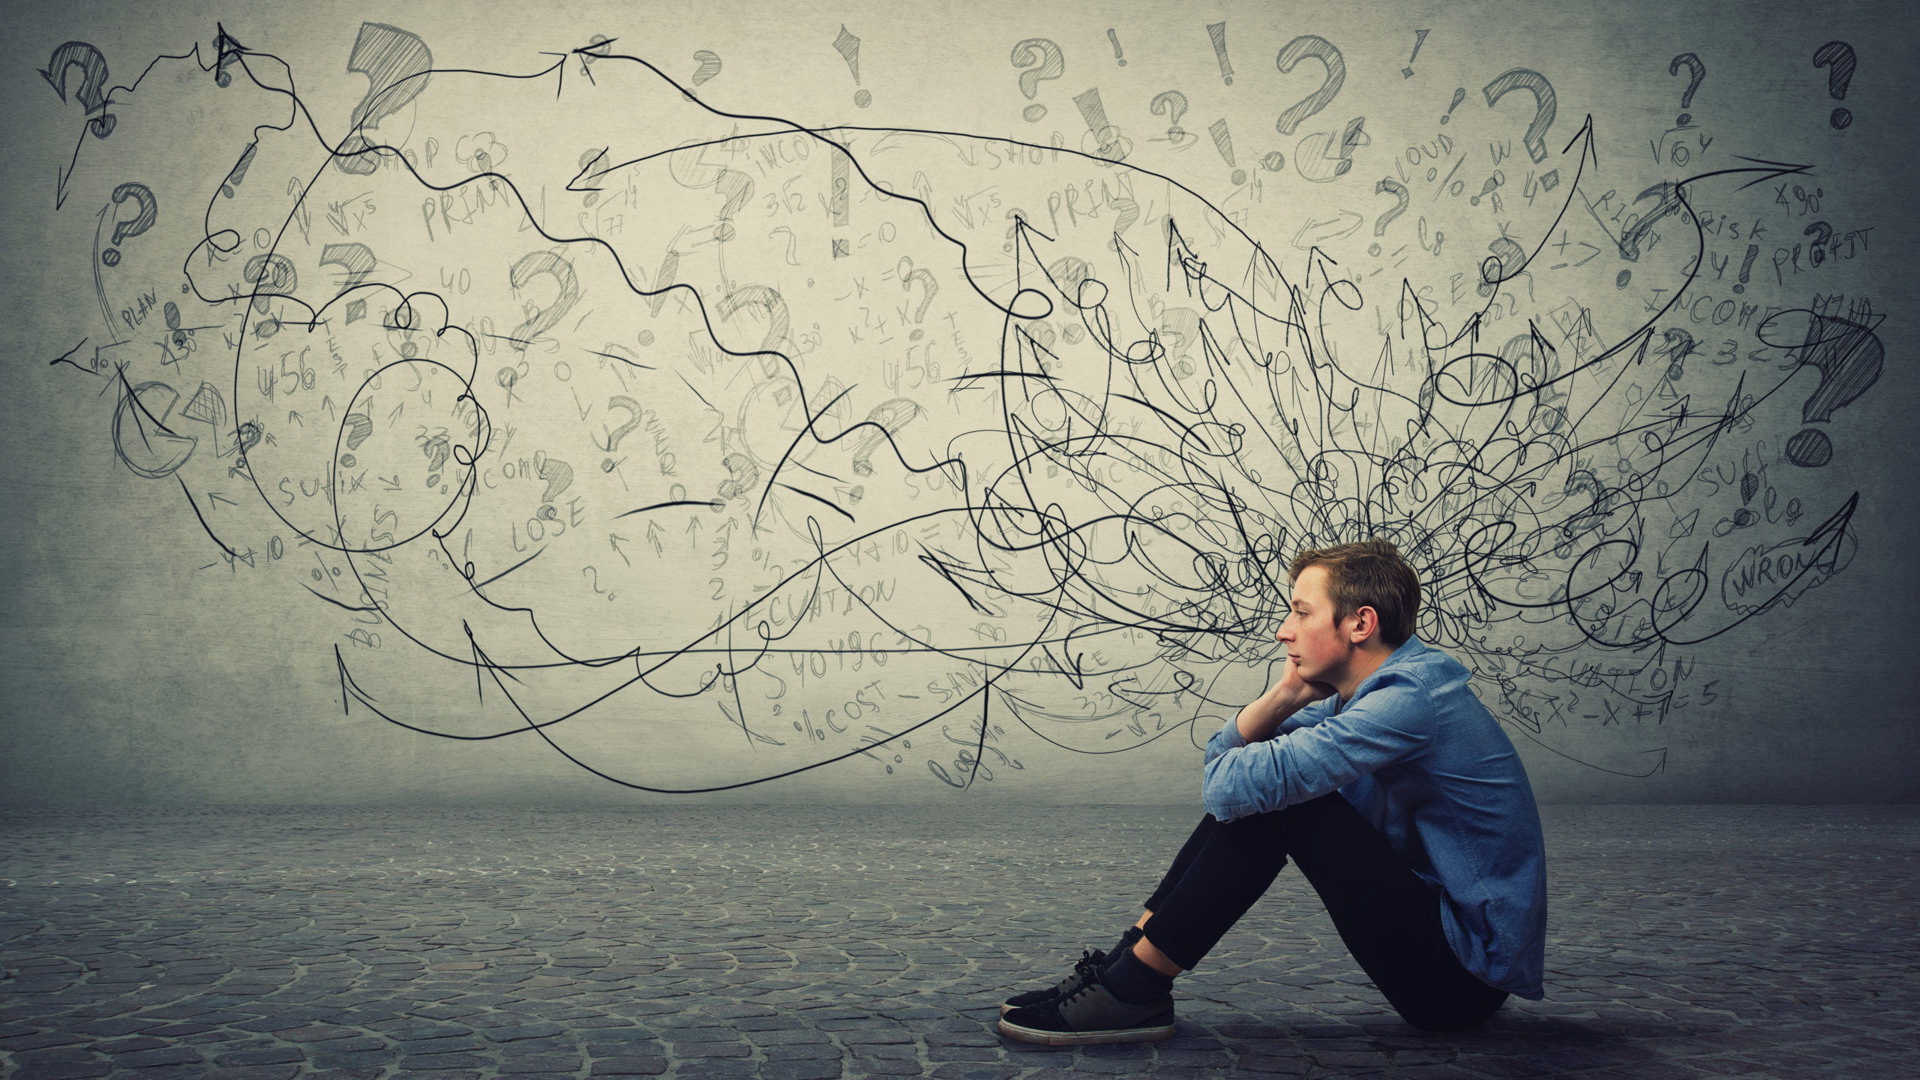 Webinar: Desafios emocionais frente a nova realidade que estamos vivendo